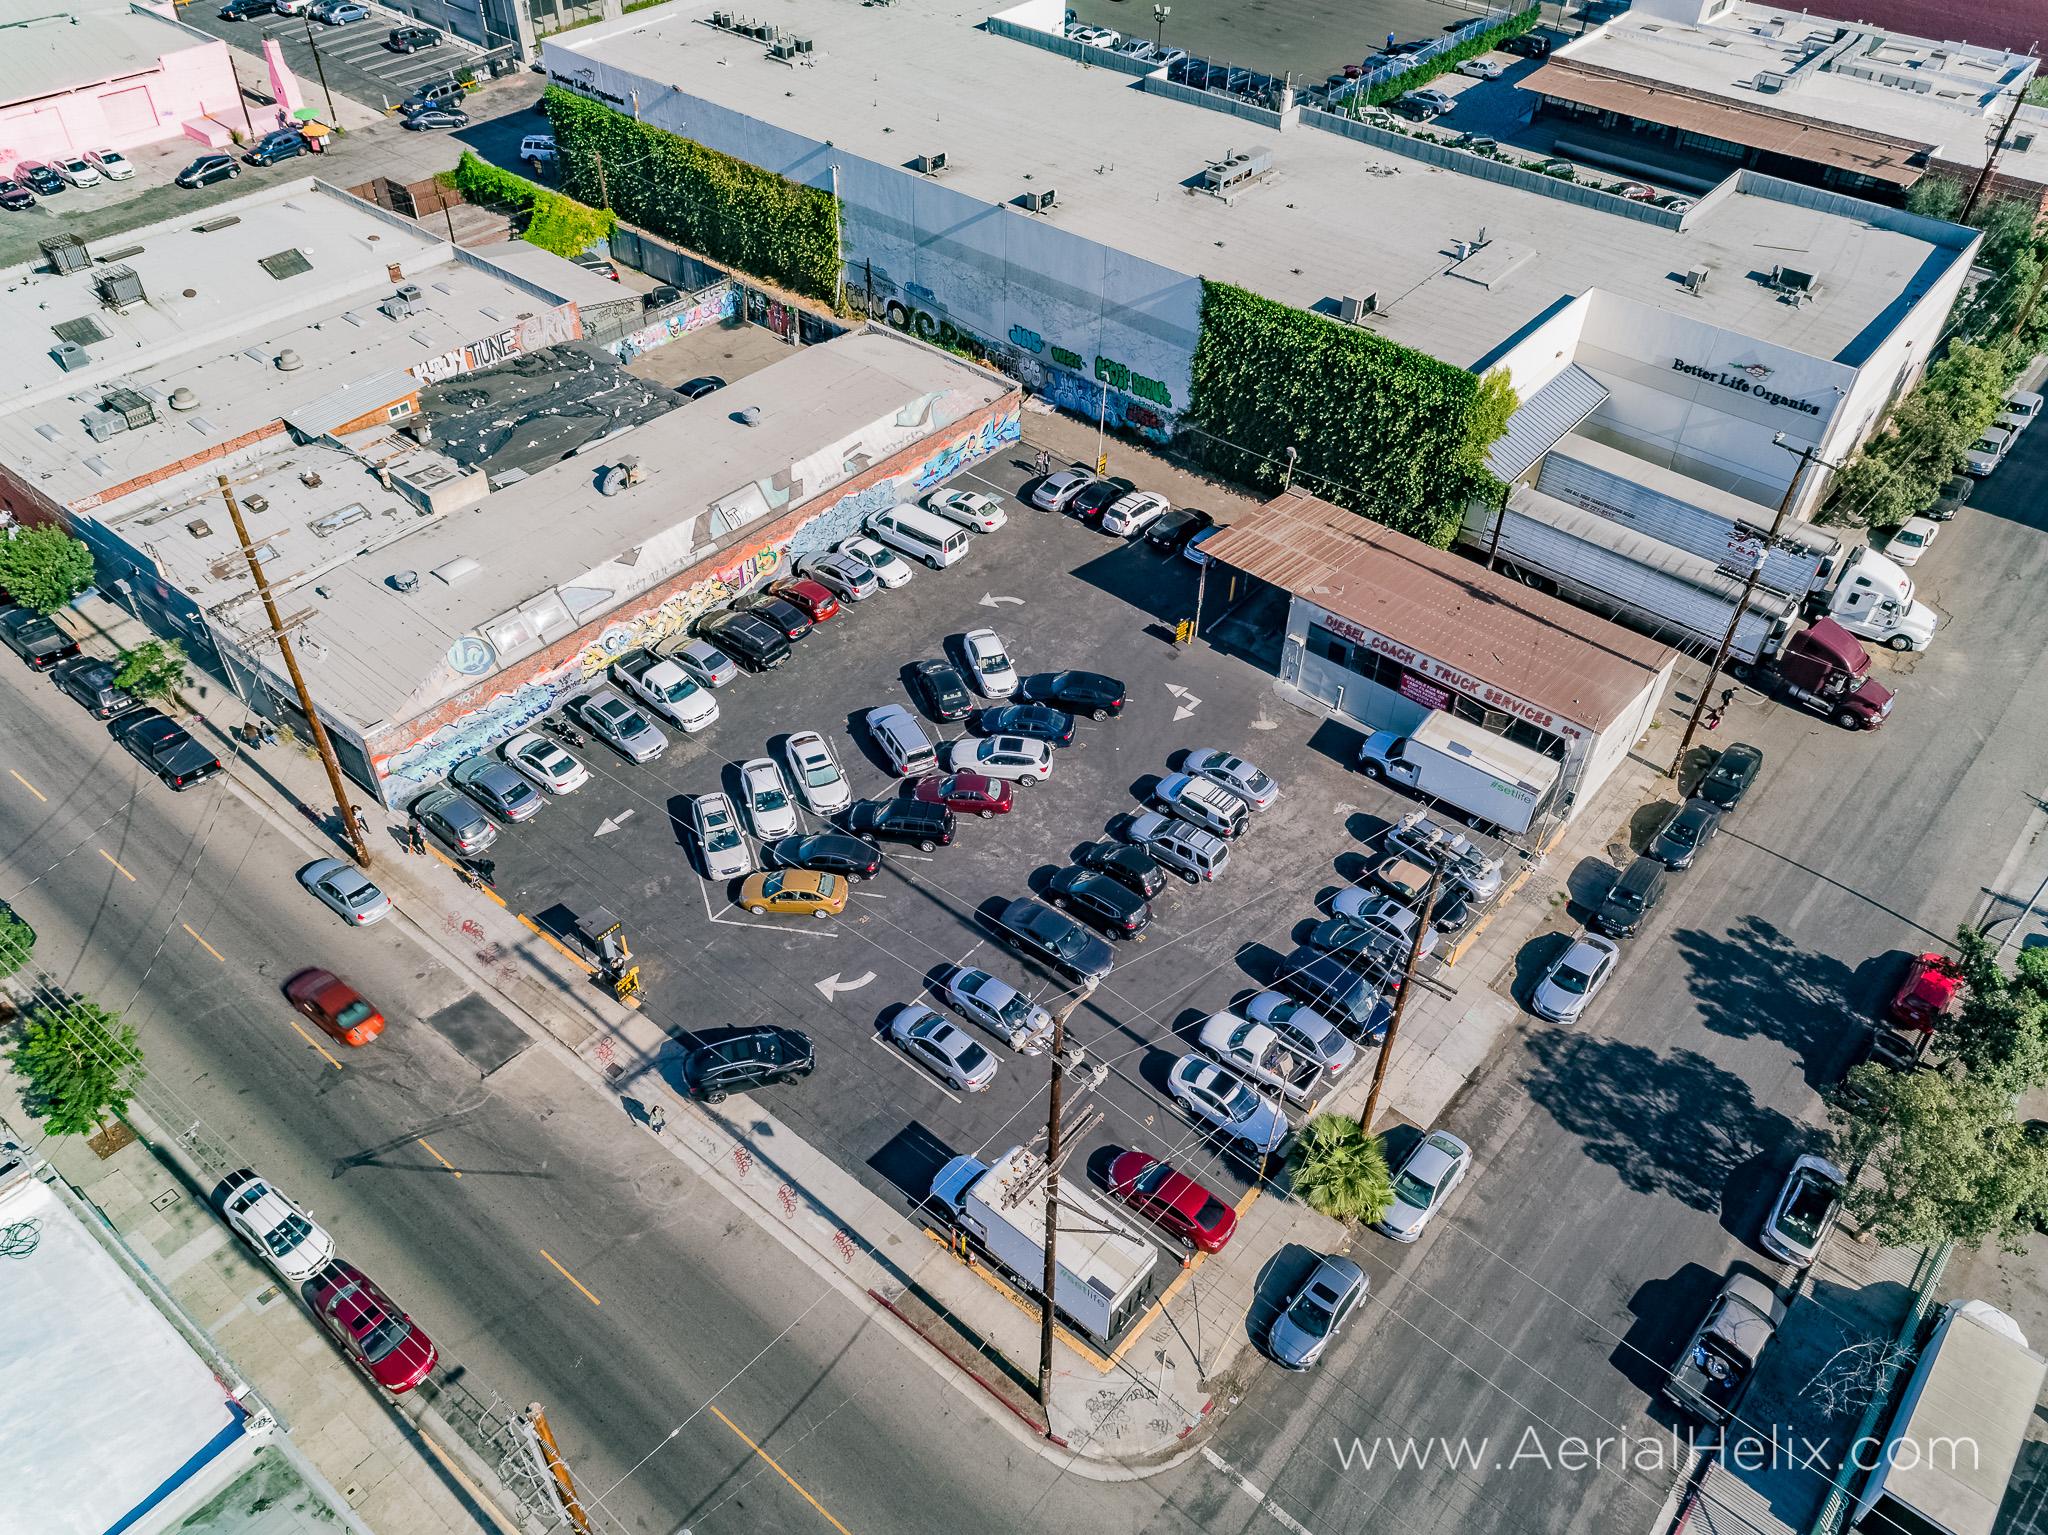 Perfect Parking 2 aerial photographer-25.jpg